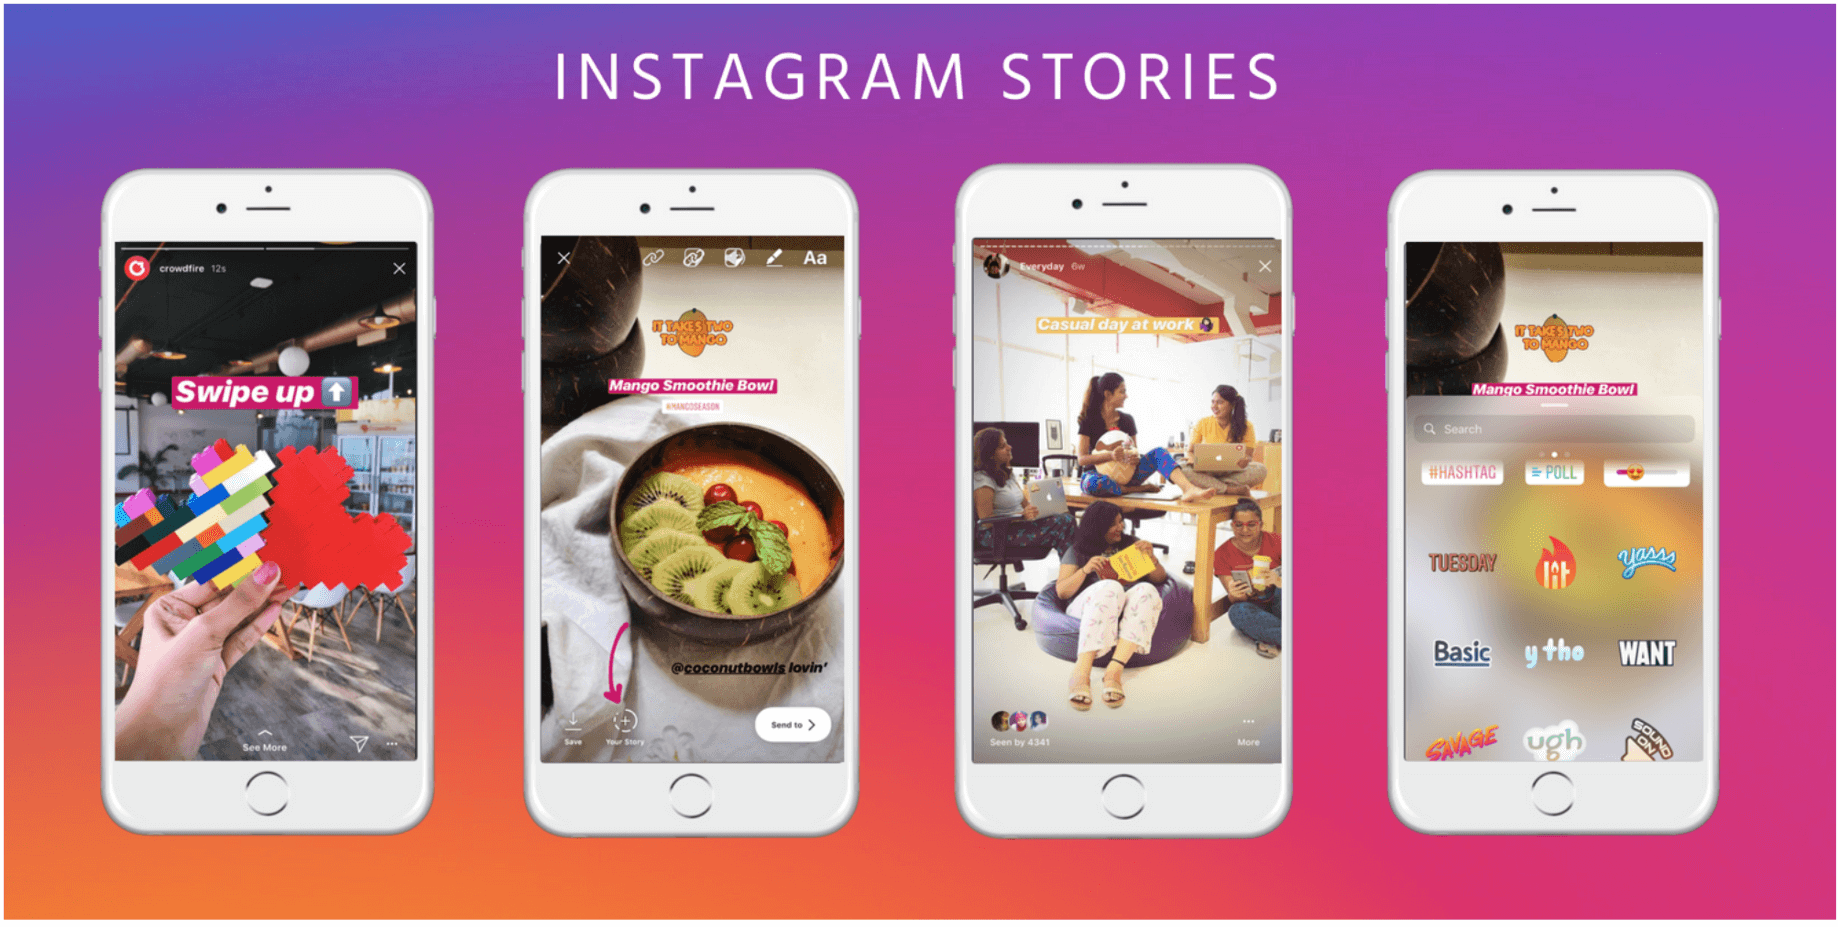 exemplo de story do instagram